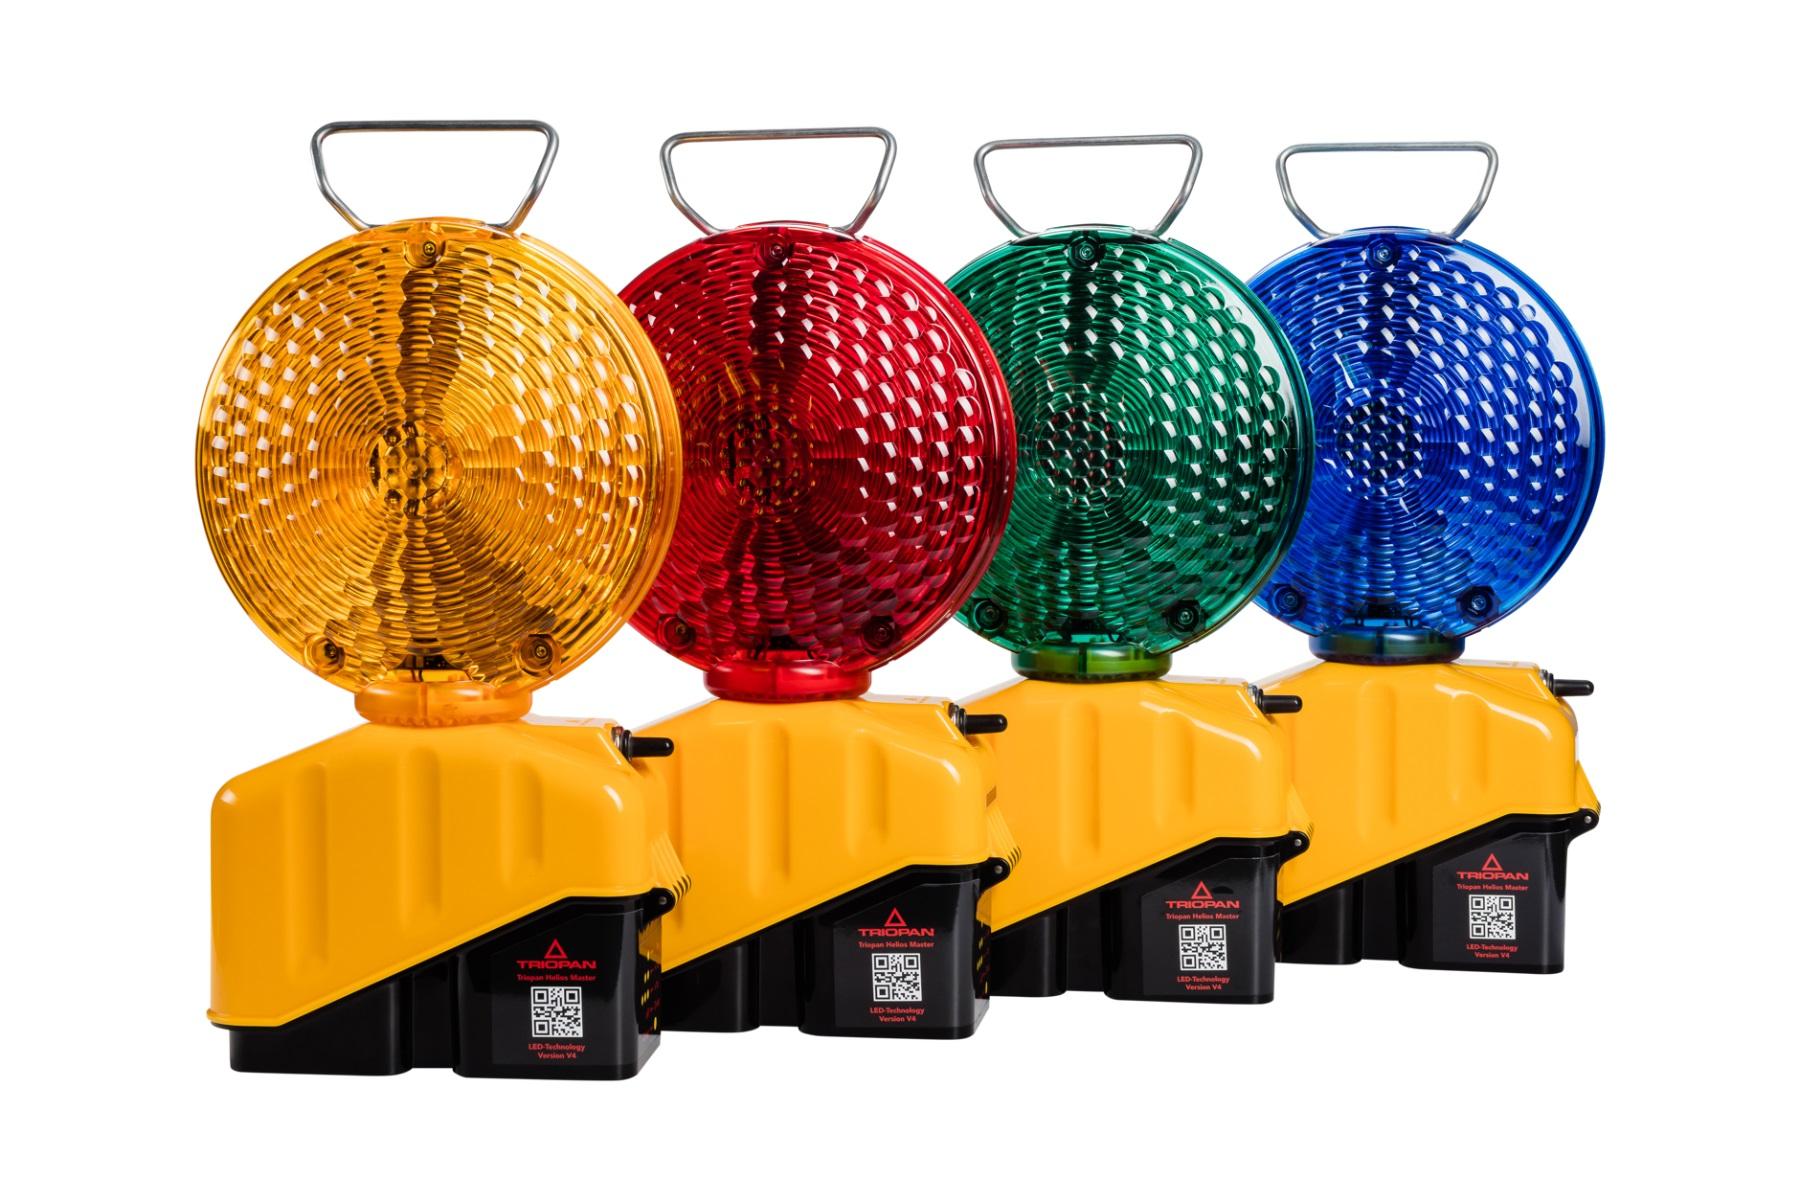 Signalisationslampe Helios LED Master V4 mit Klappfuss